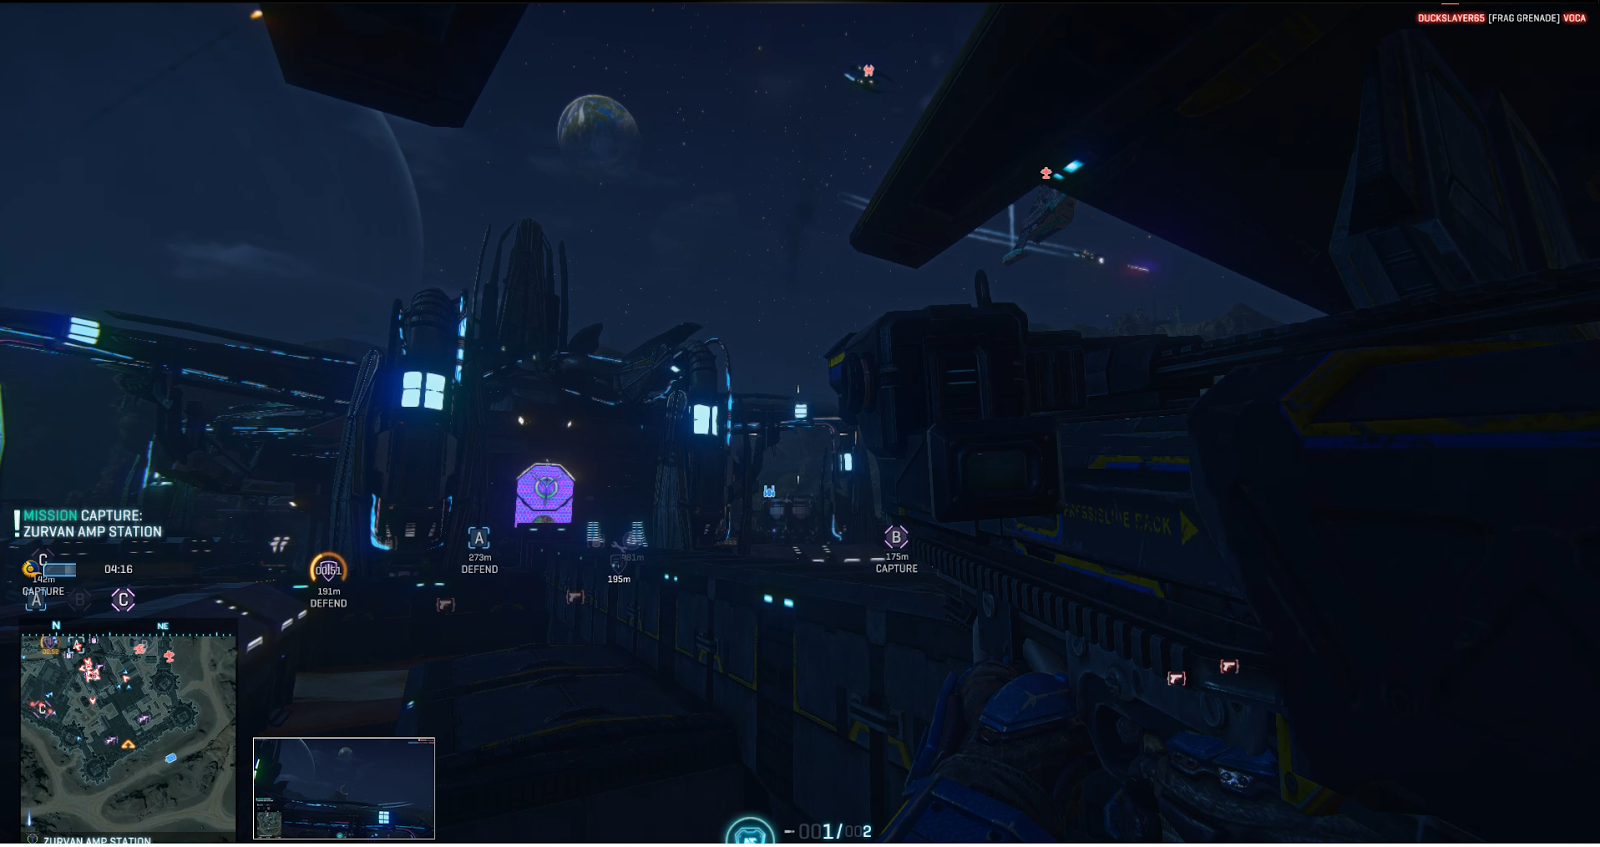 Vanu base, planetside 2, rocketlauncher, phoenix